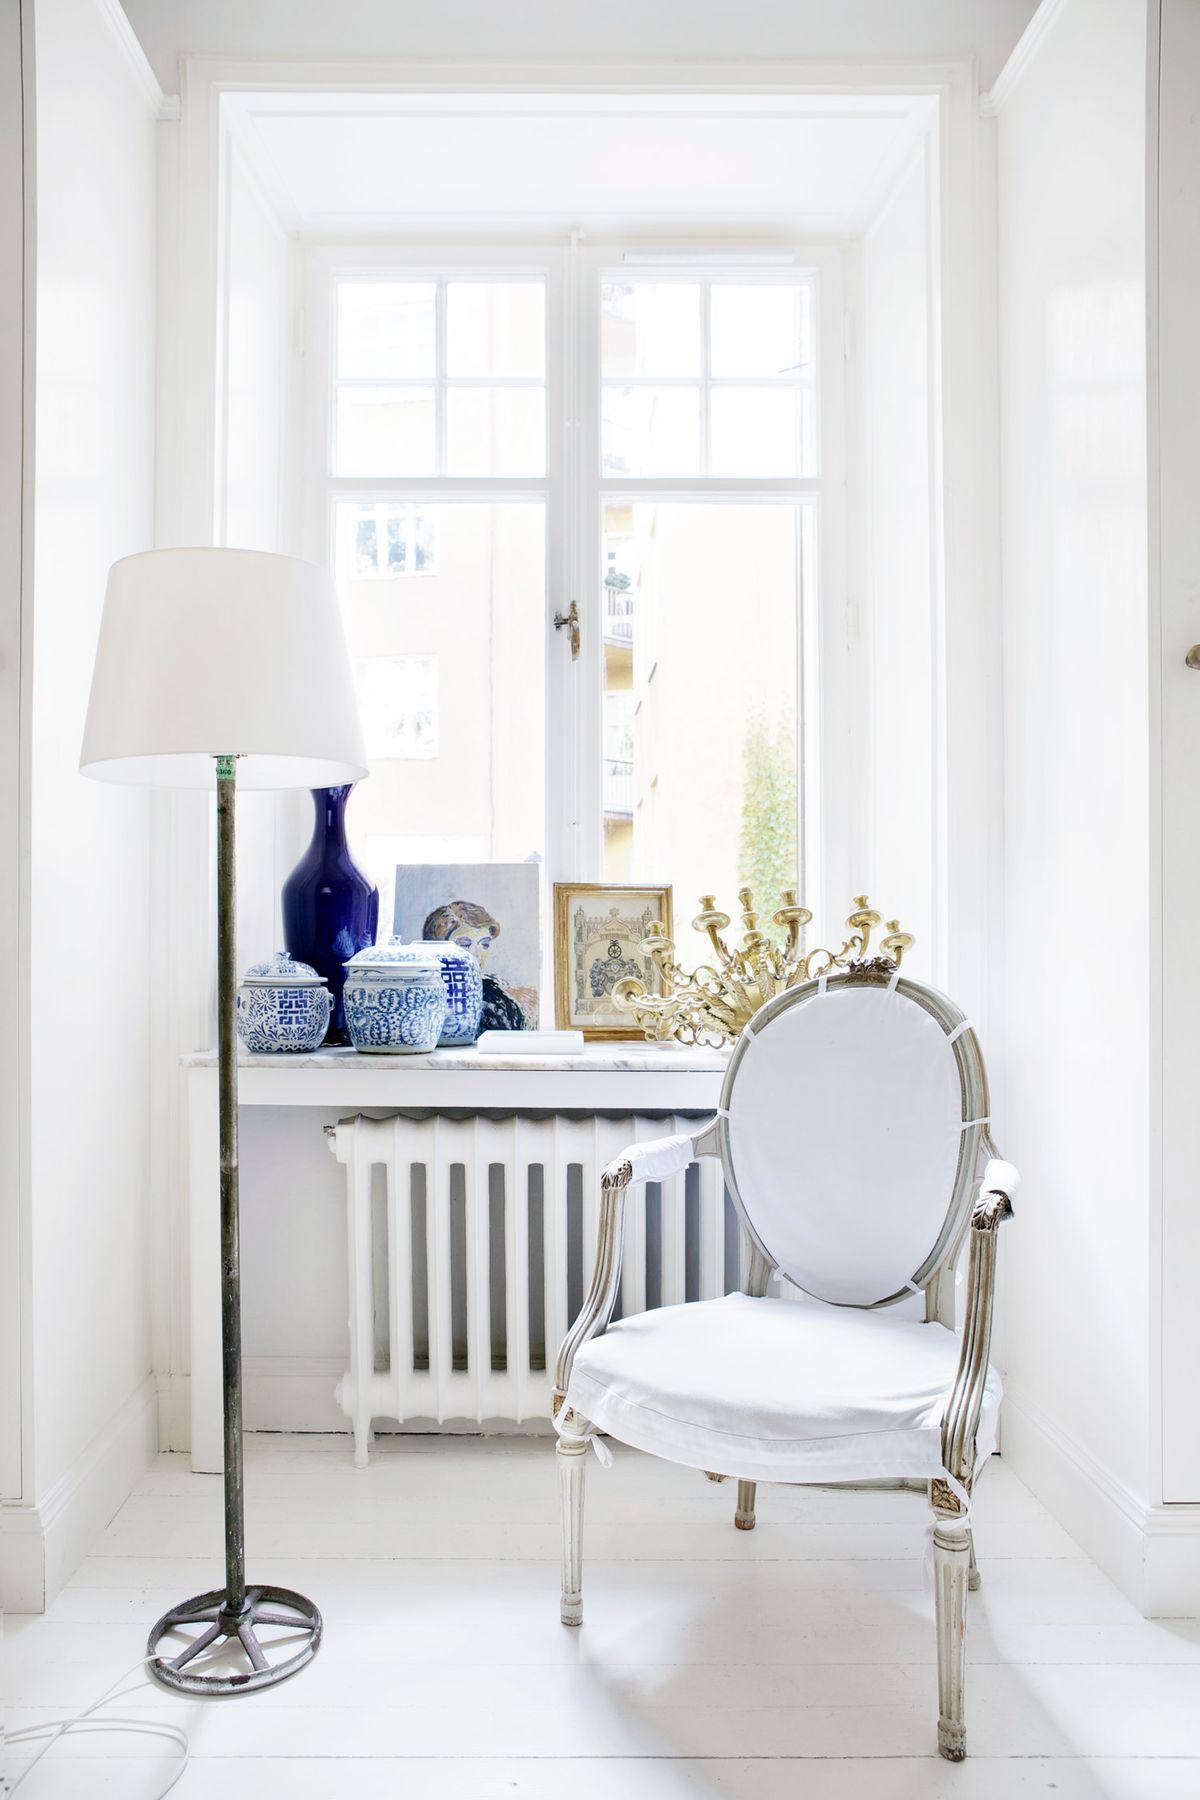 Pär Bengtsson Home Interior Editorial Photography34.jpg